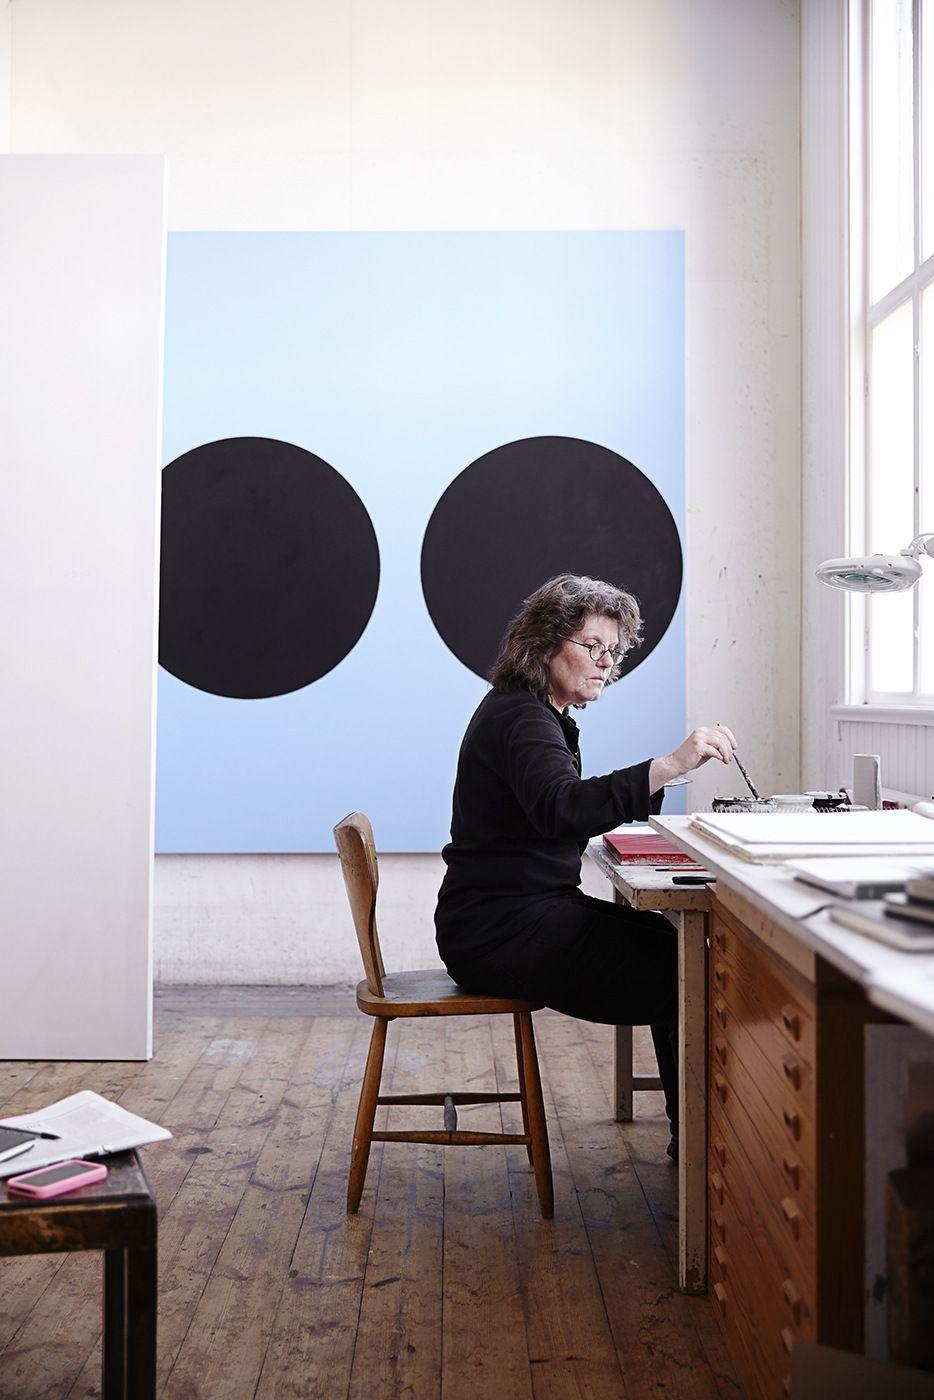 CHRISTOPHER HUNT I PHOTOGRAPHER - Ann Edholm for Artlover